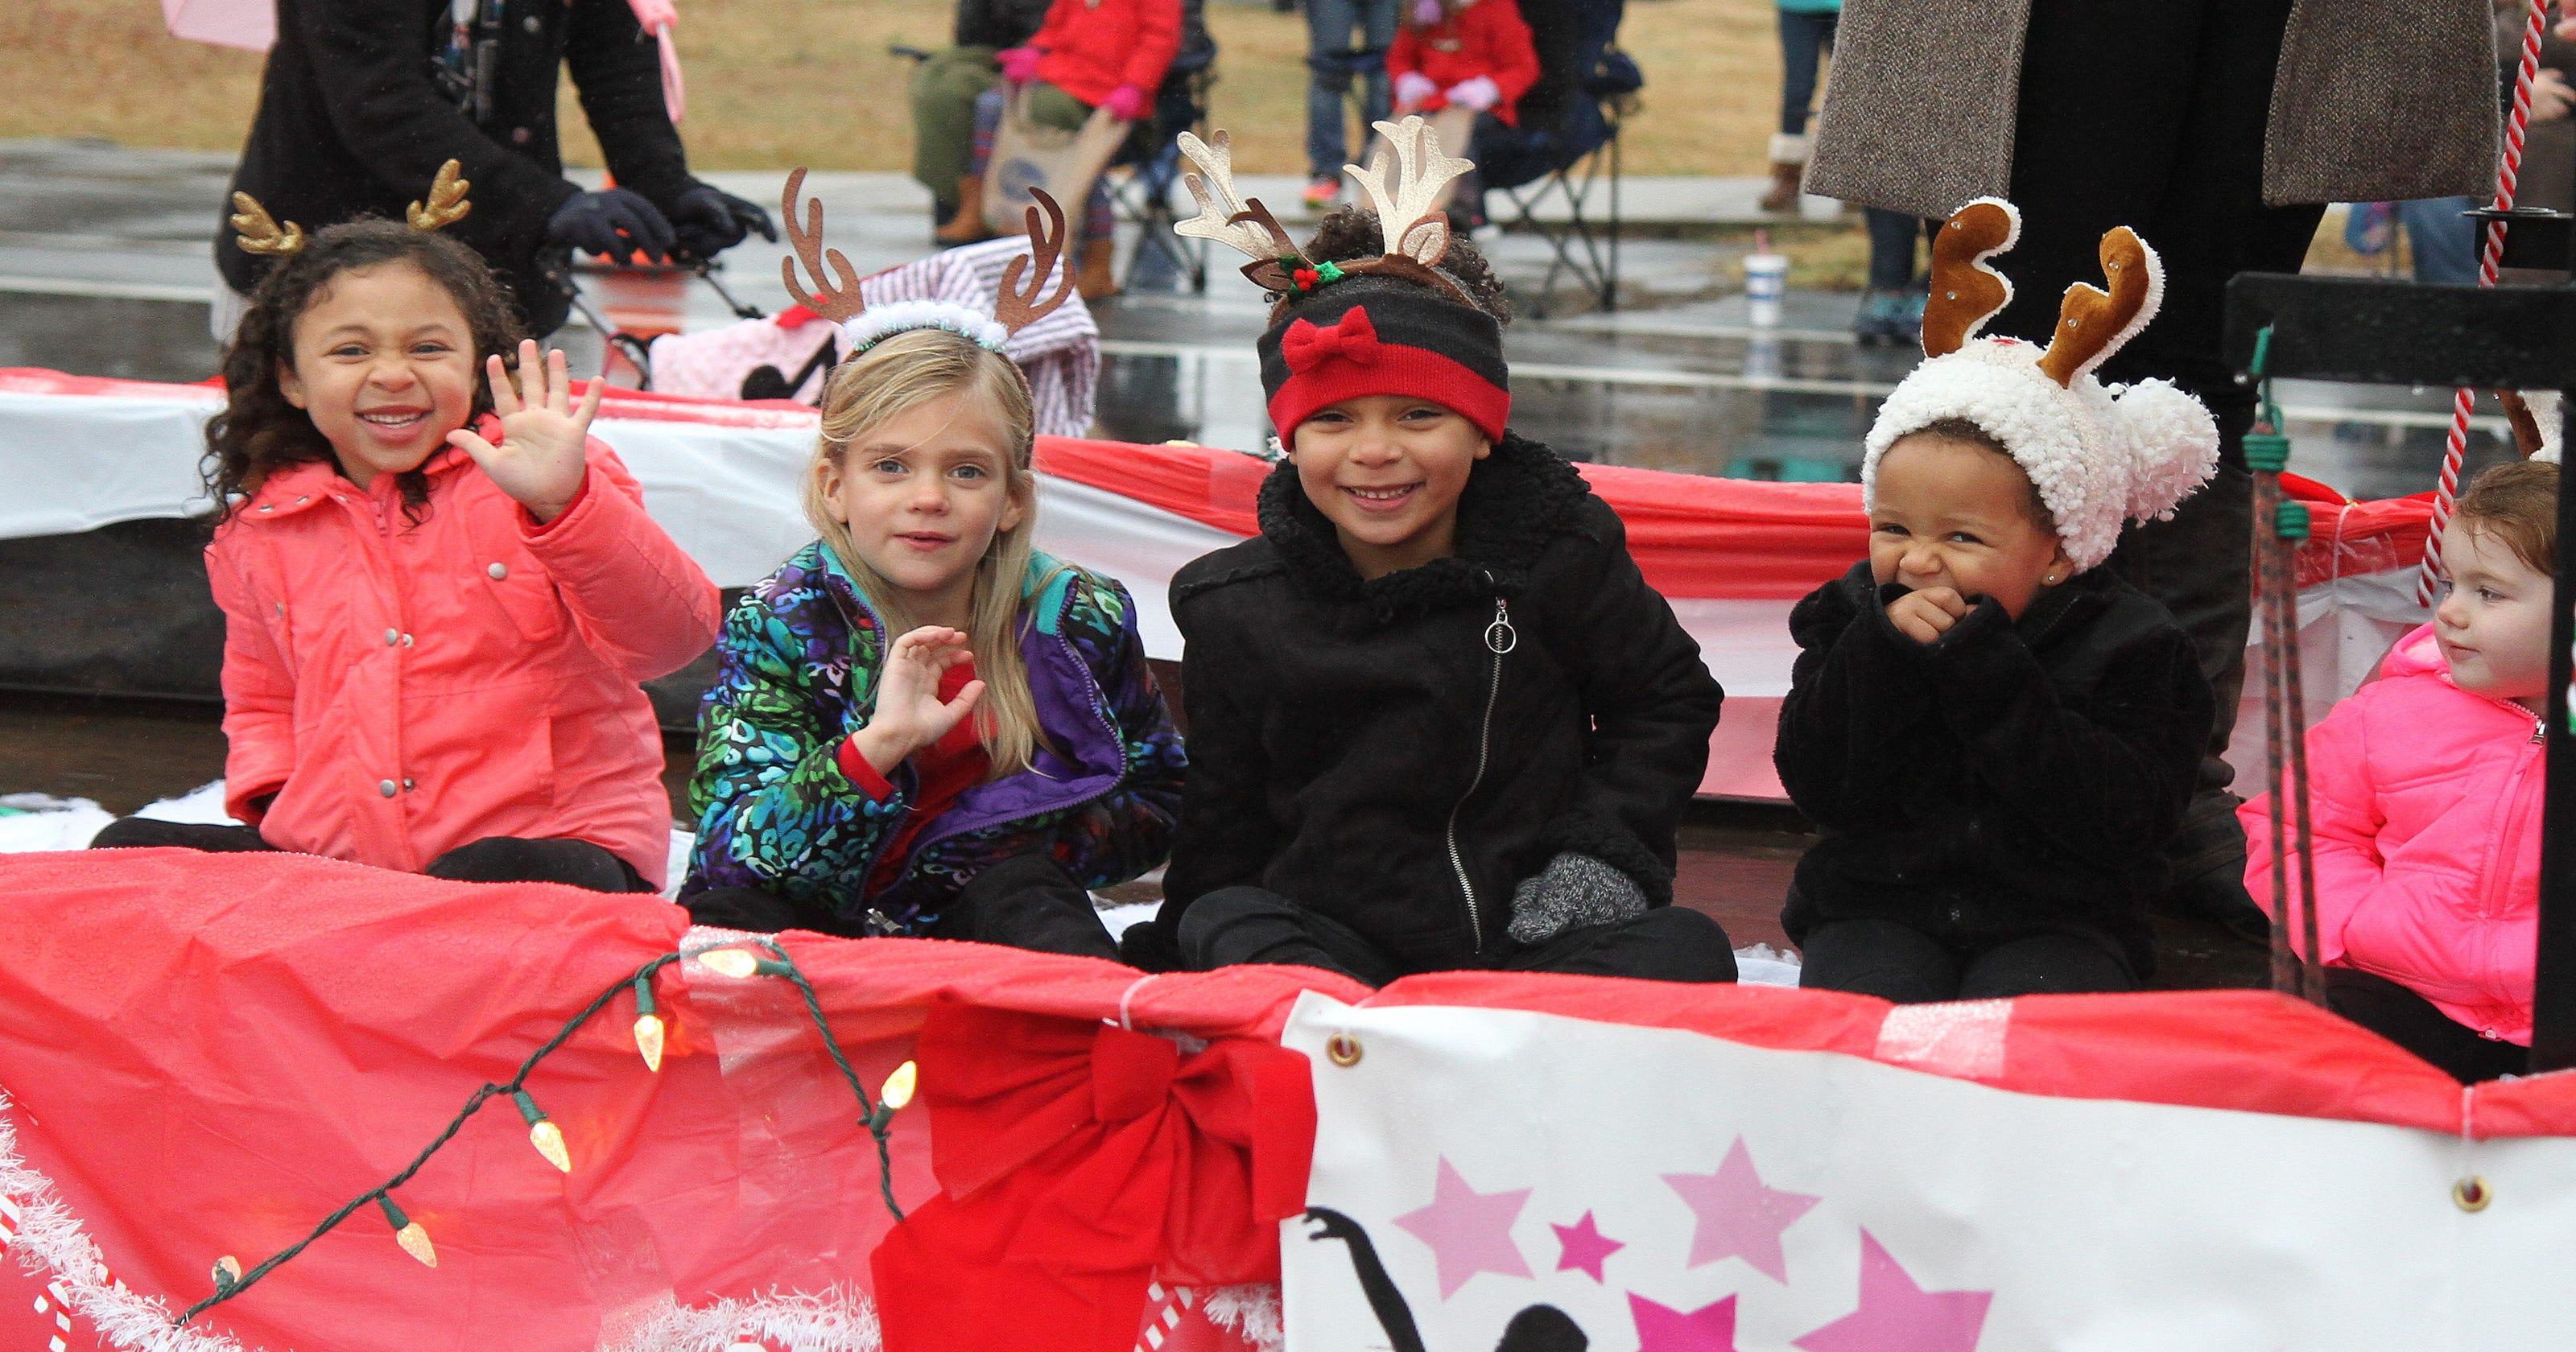 Hendersonville Tn Christmas Parade 2019 | Christmas 2019